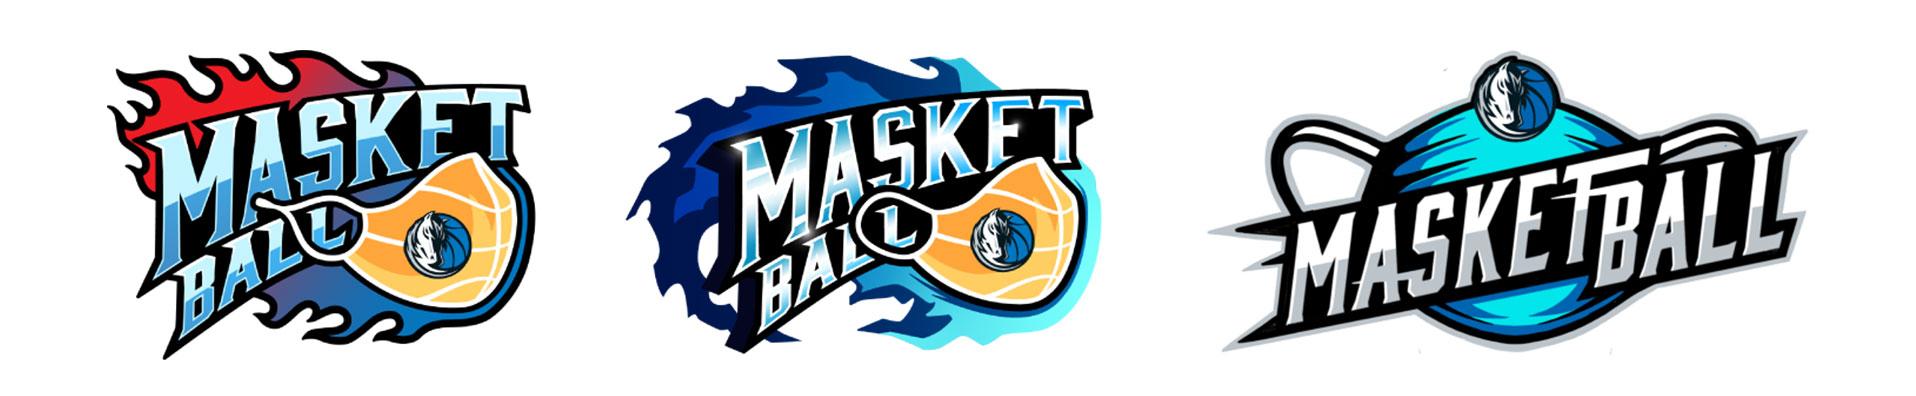 Dallas Mavs Masketball logo